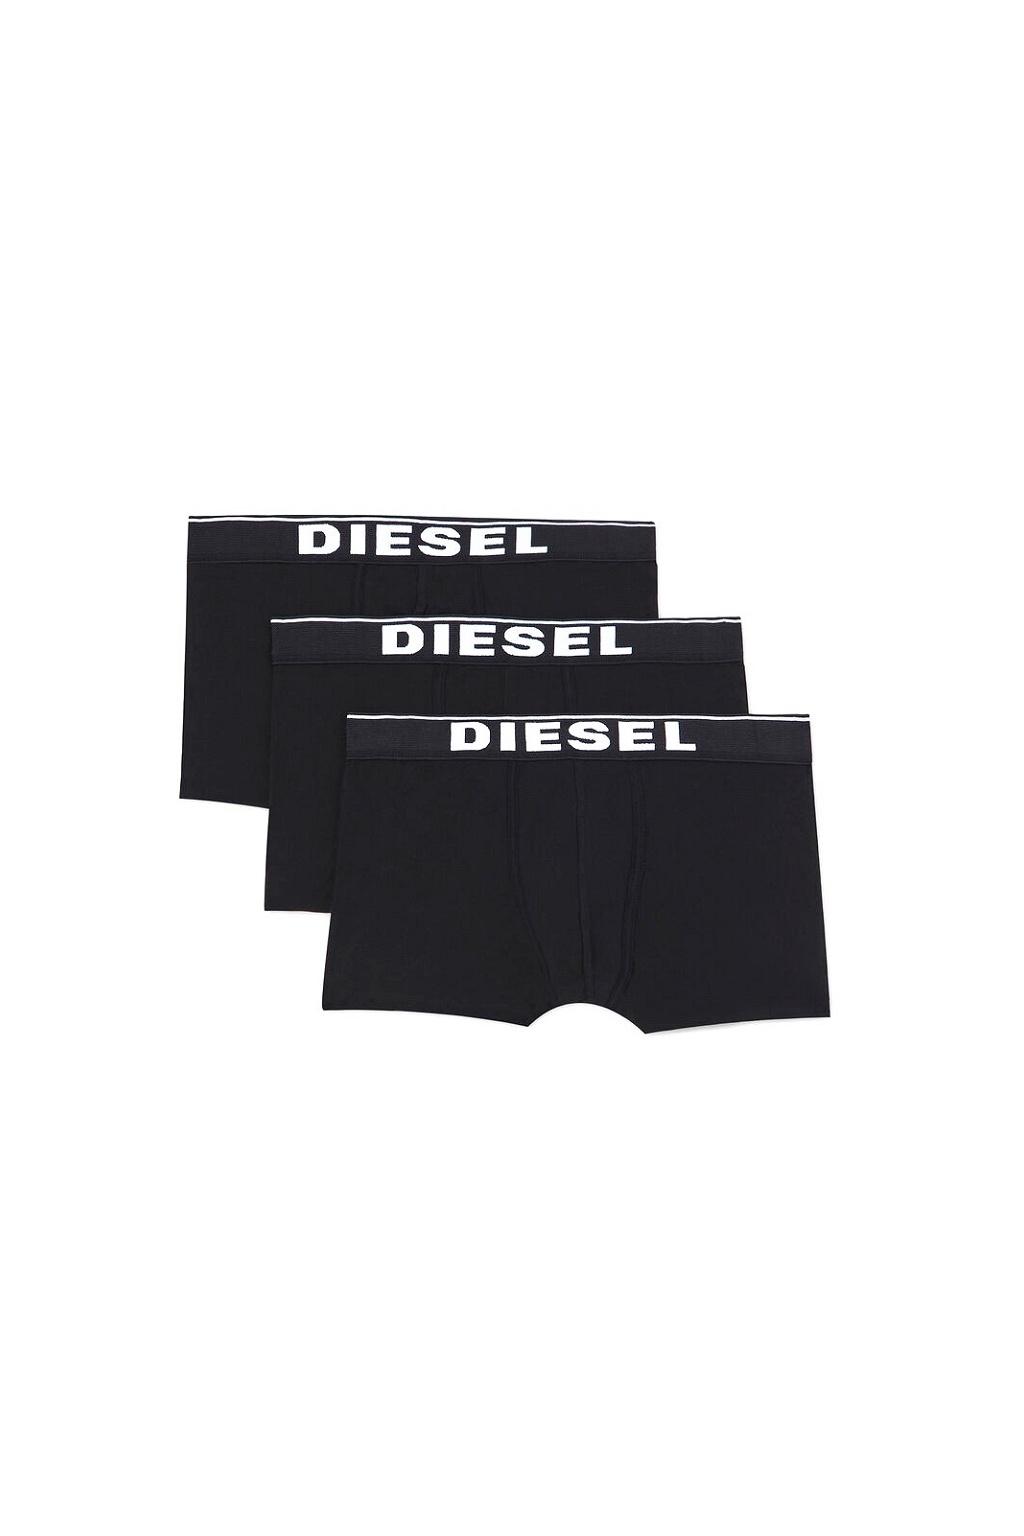 00ST3V 0JKKB E4101 Diesel boxerky Umbx Damienthreepack  černé